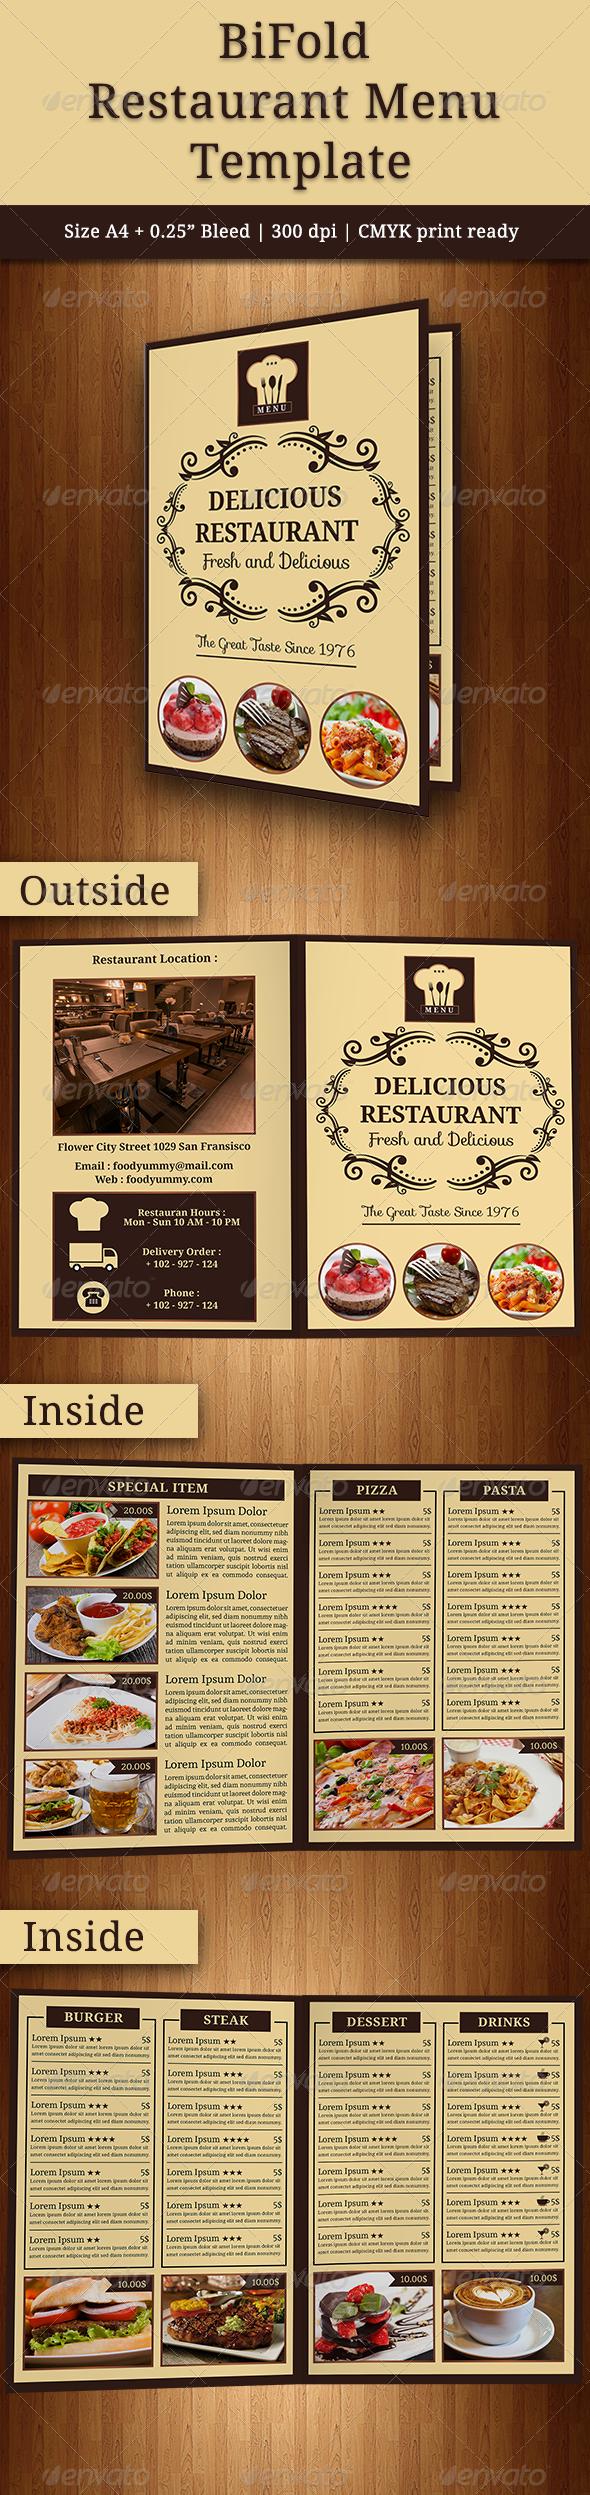 GraphicRiver BiFold Restaurant Menu 7974858